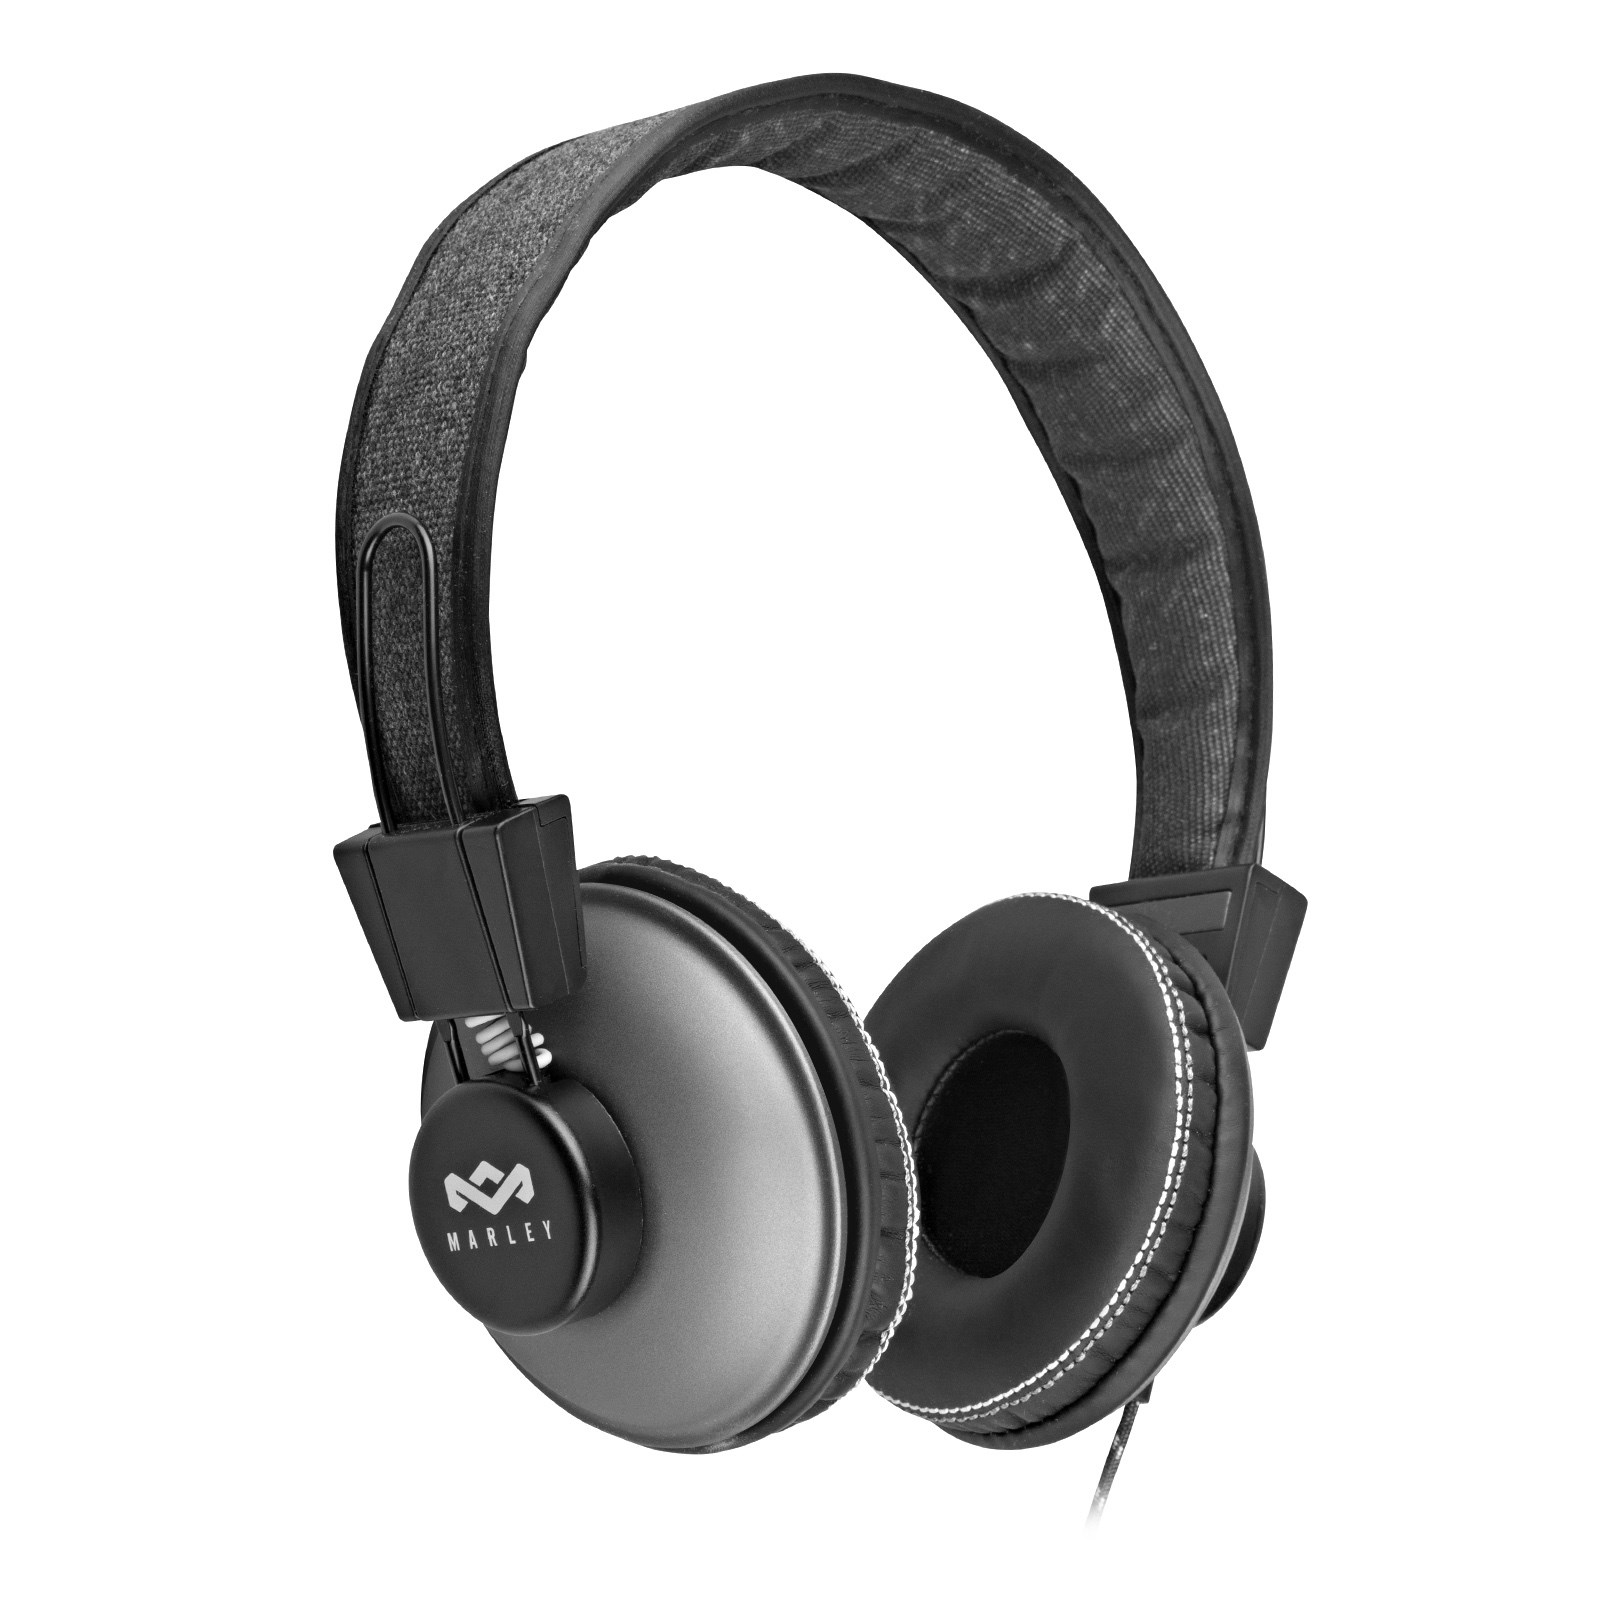 House of MarleyPositive Vibration On-Ear Headphones (Black) MAR-EM-JH013-PS-B1-LP